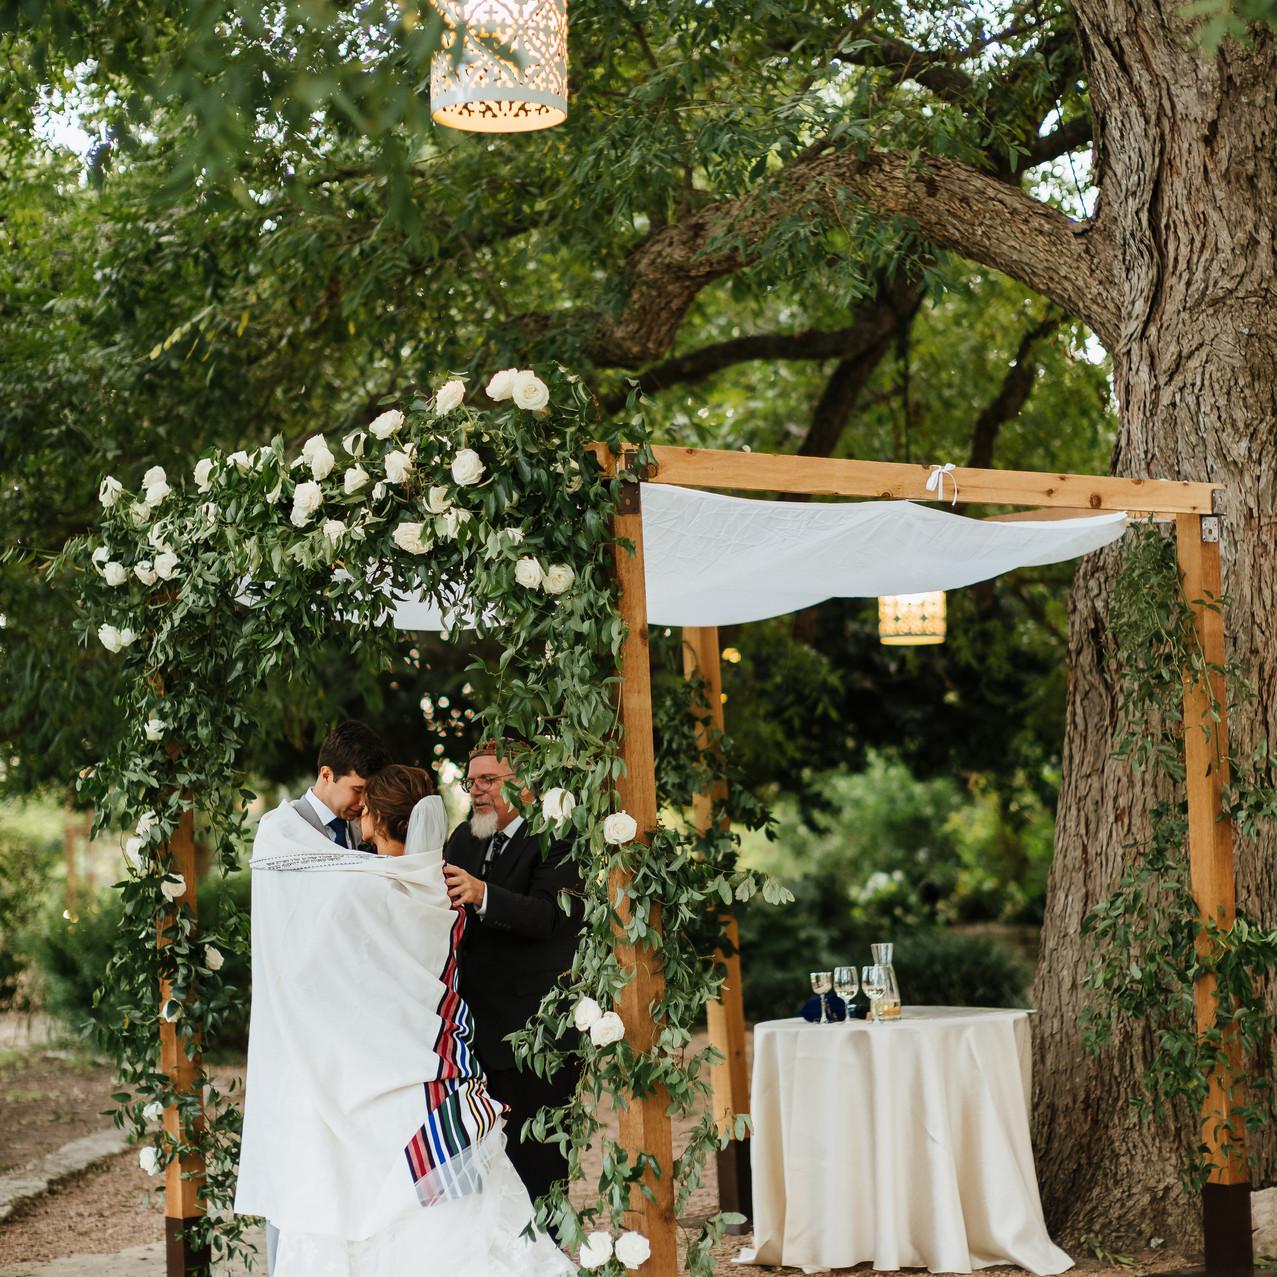 43-Ozer-Gati Wedding-Barr Mansion Jewish